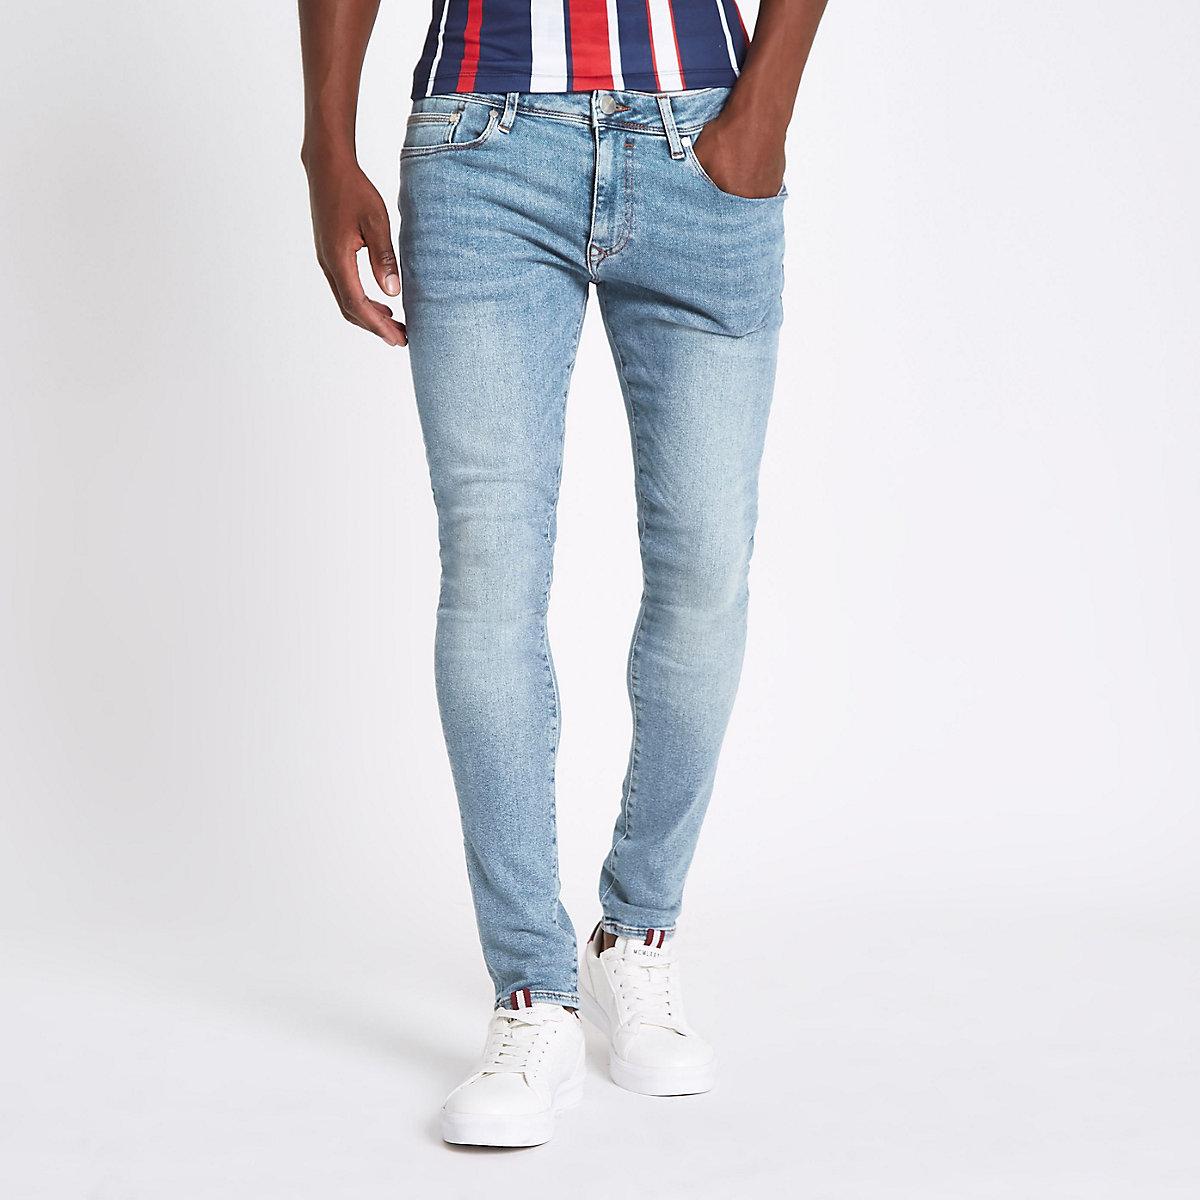 Light blue super skinny jeans